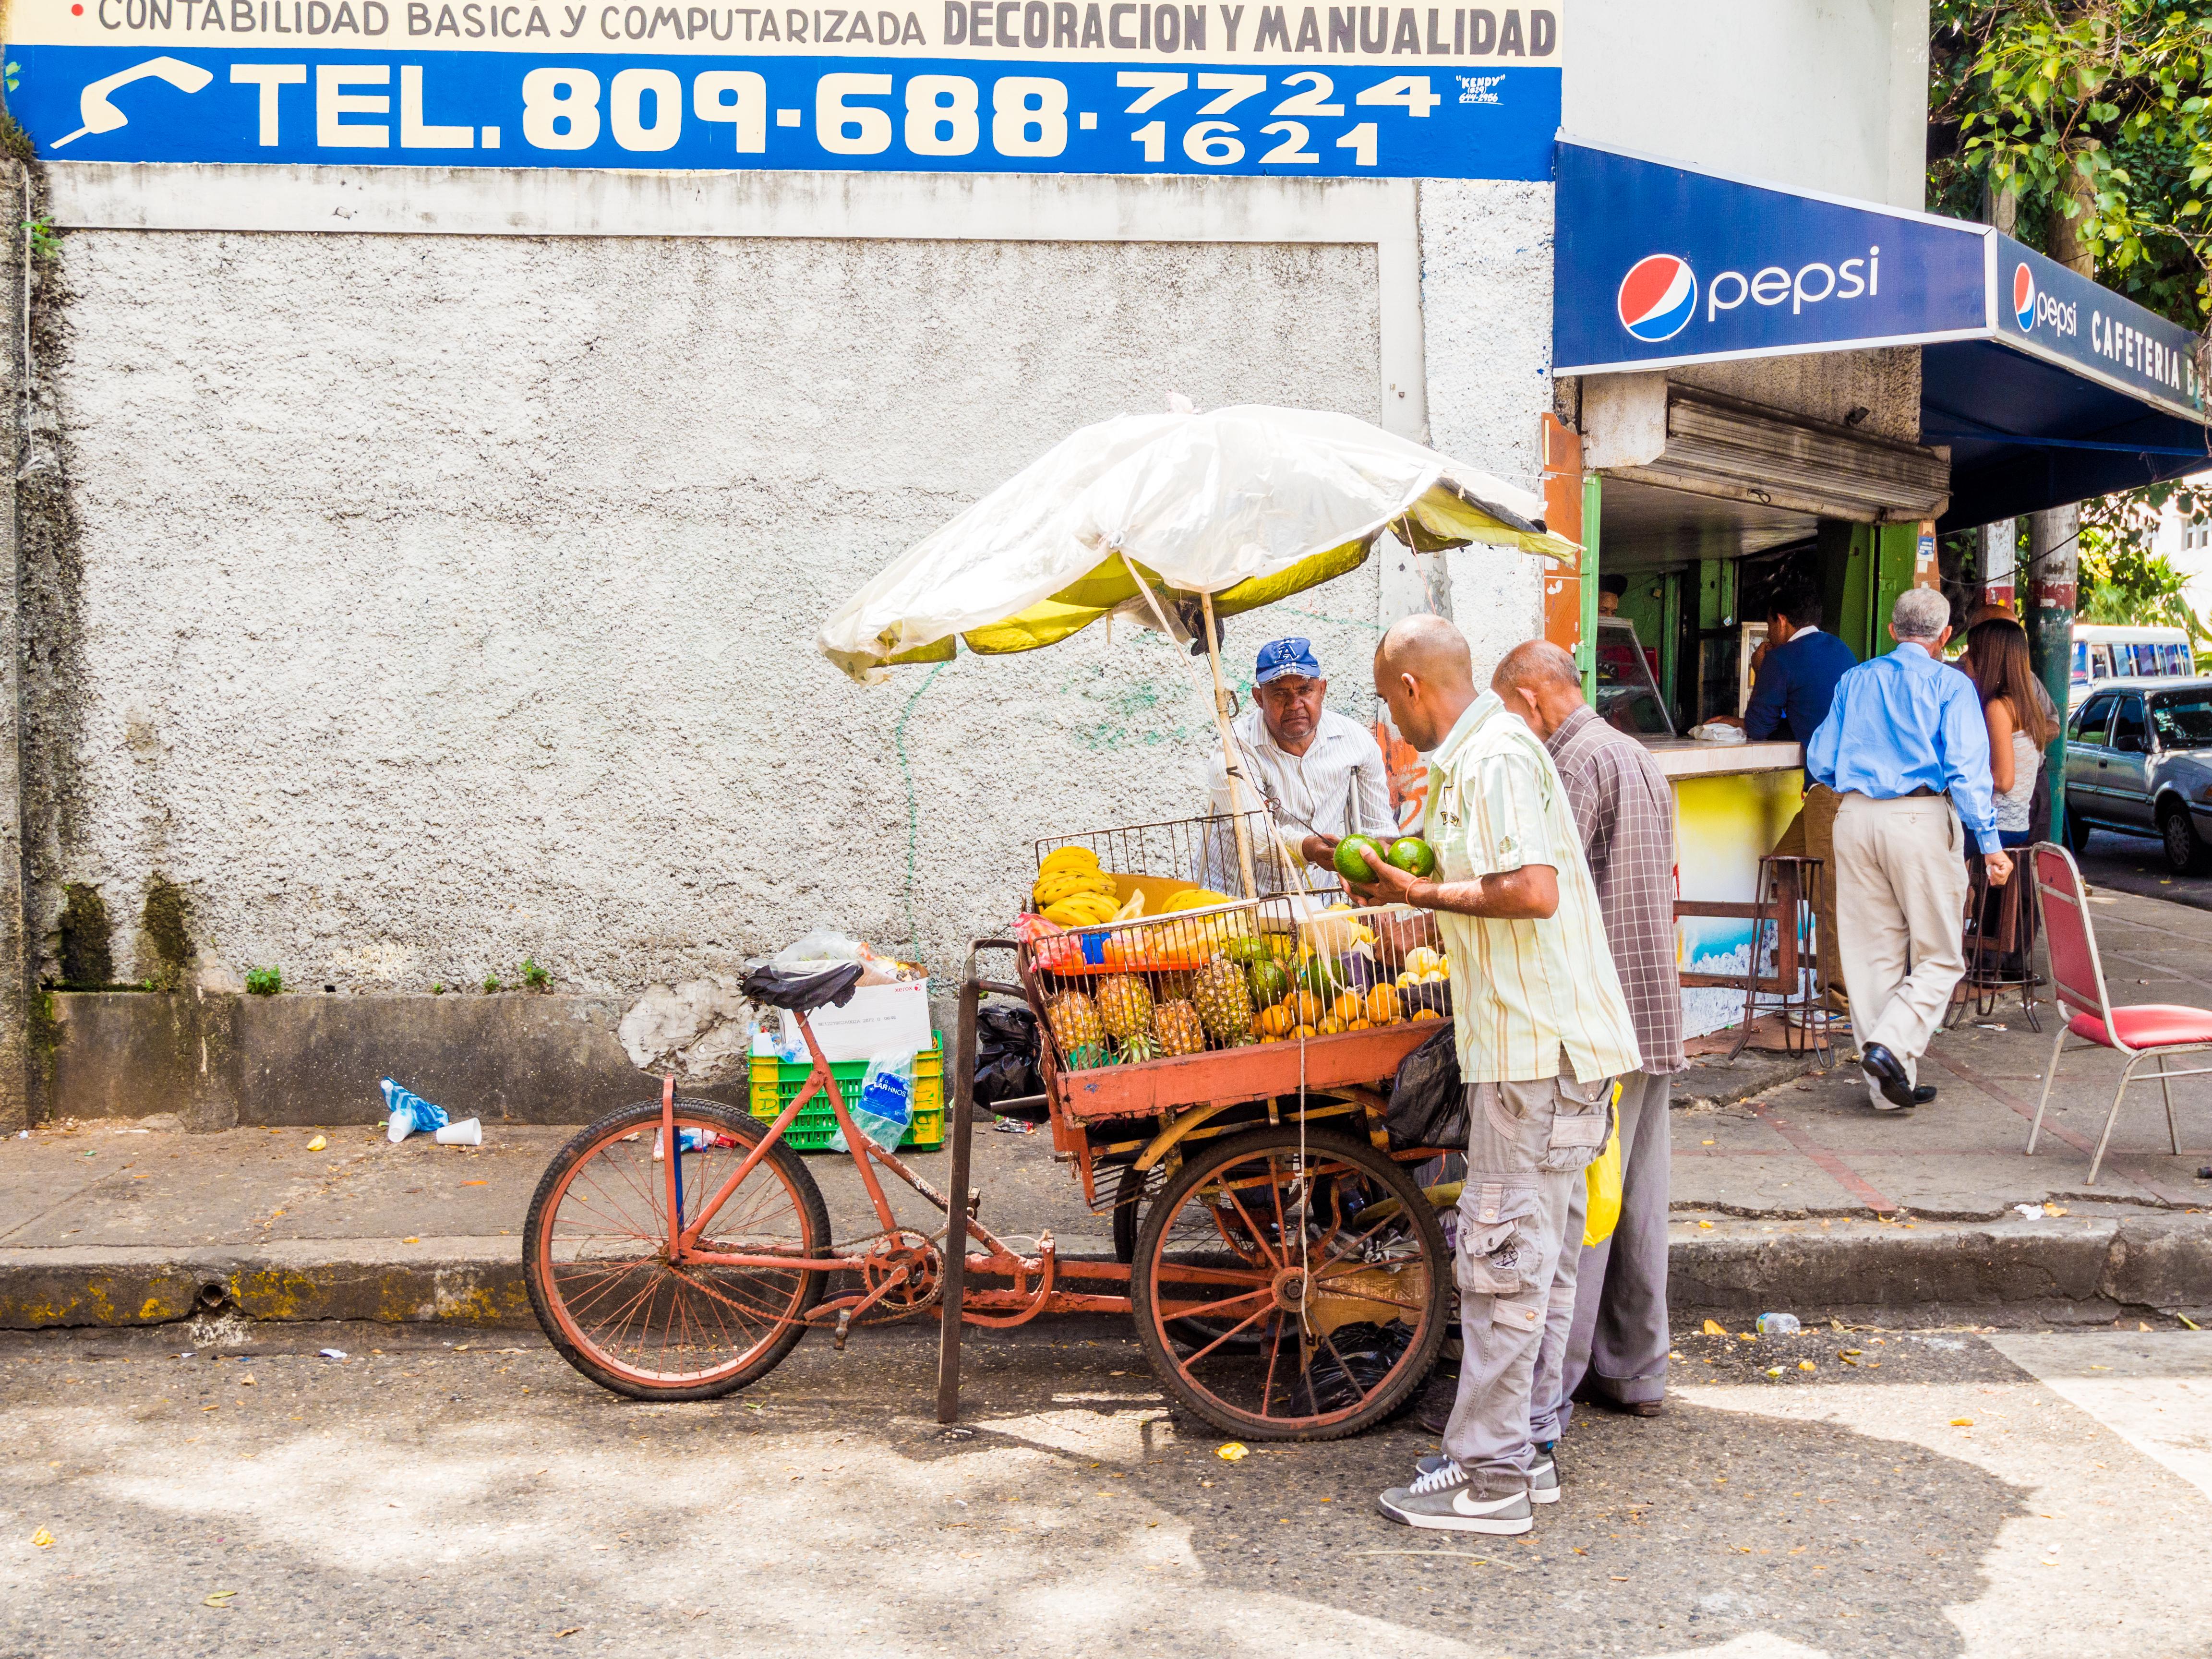 Santo Domingo, Dominican Republic - February 23, 2013: Fruit vendor preparing fruits for his customer in Santo Domingo, Dominican Republic